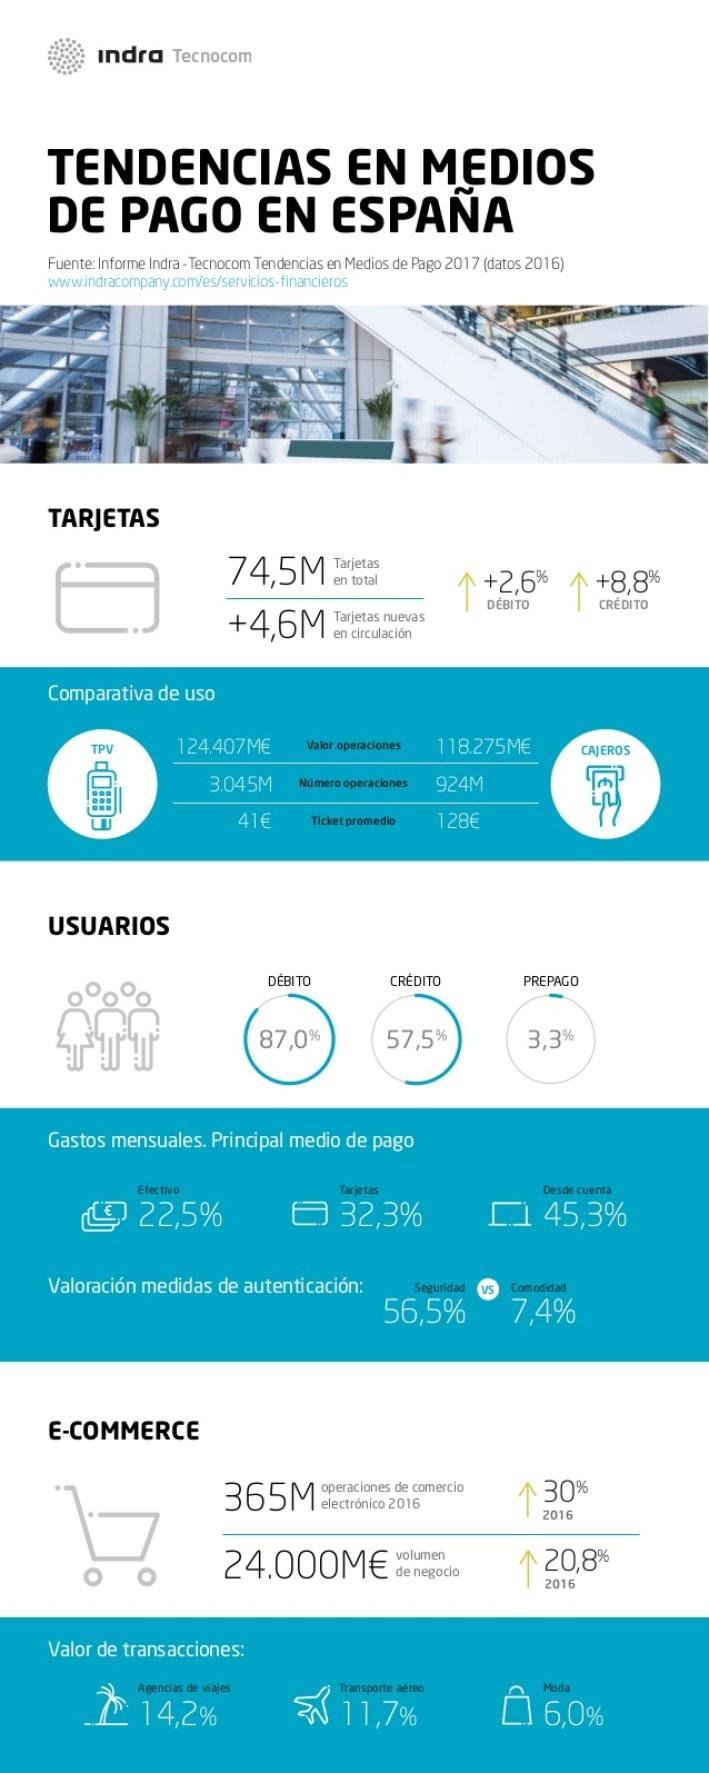 Tendencias en Medios de Pago en España